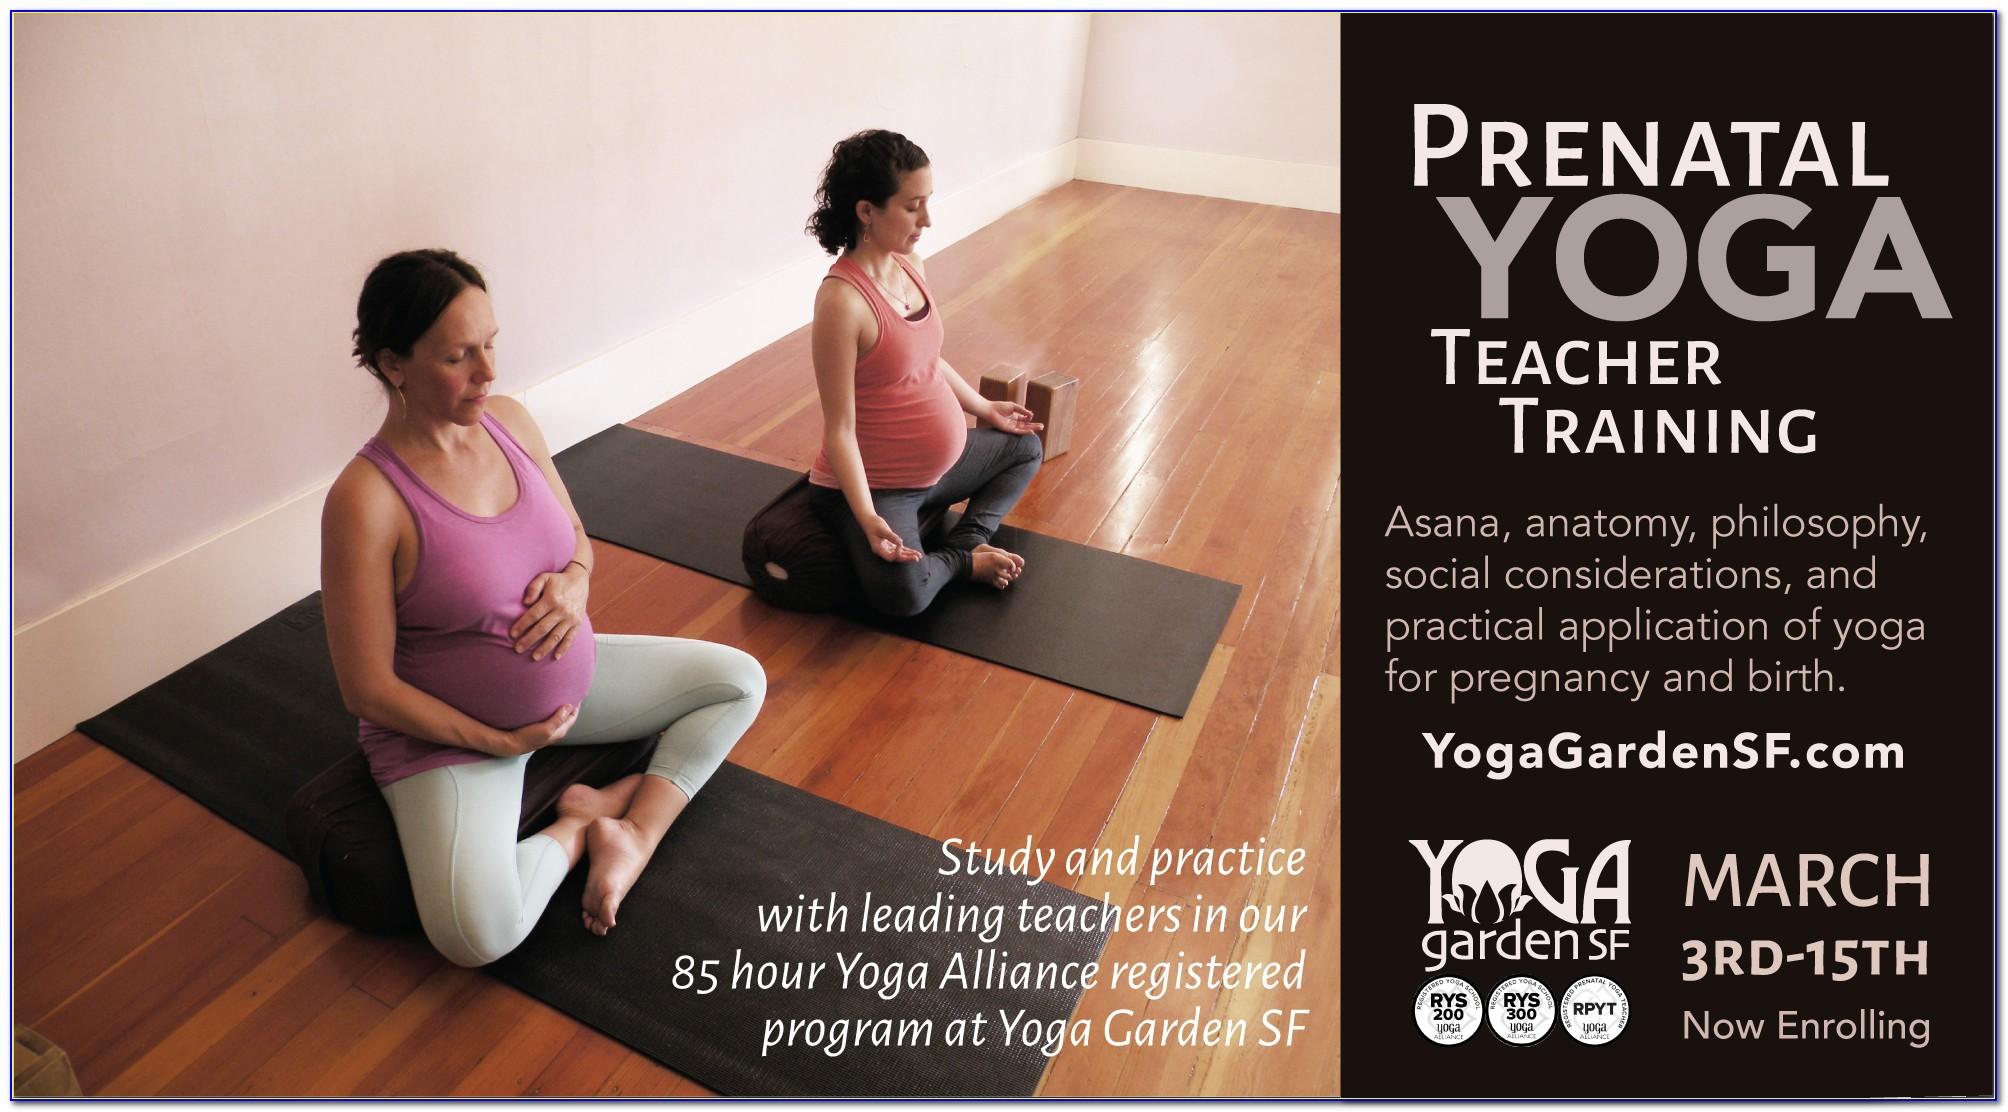 Prenatal Yoga Certification Yoga Alliance